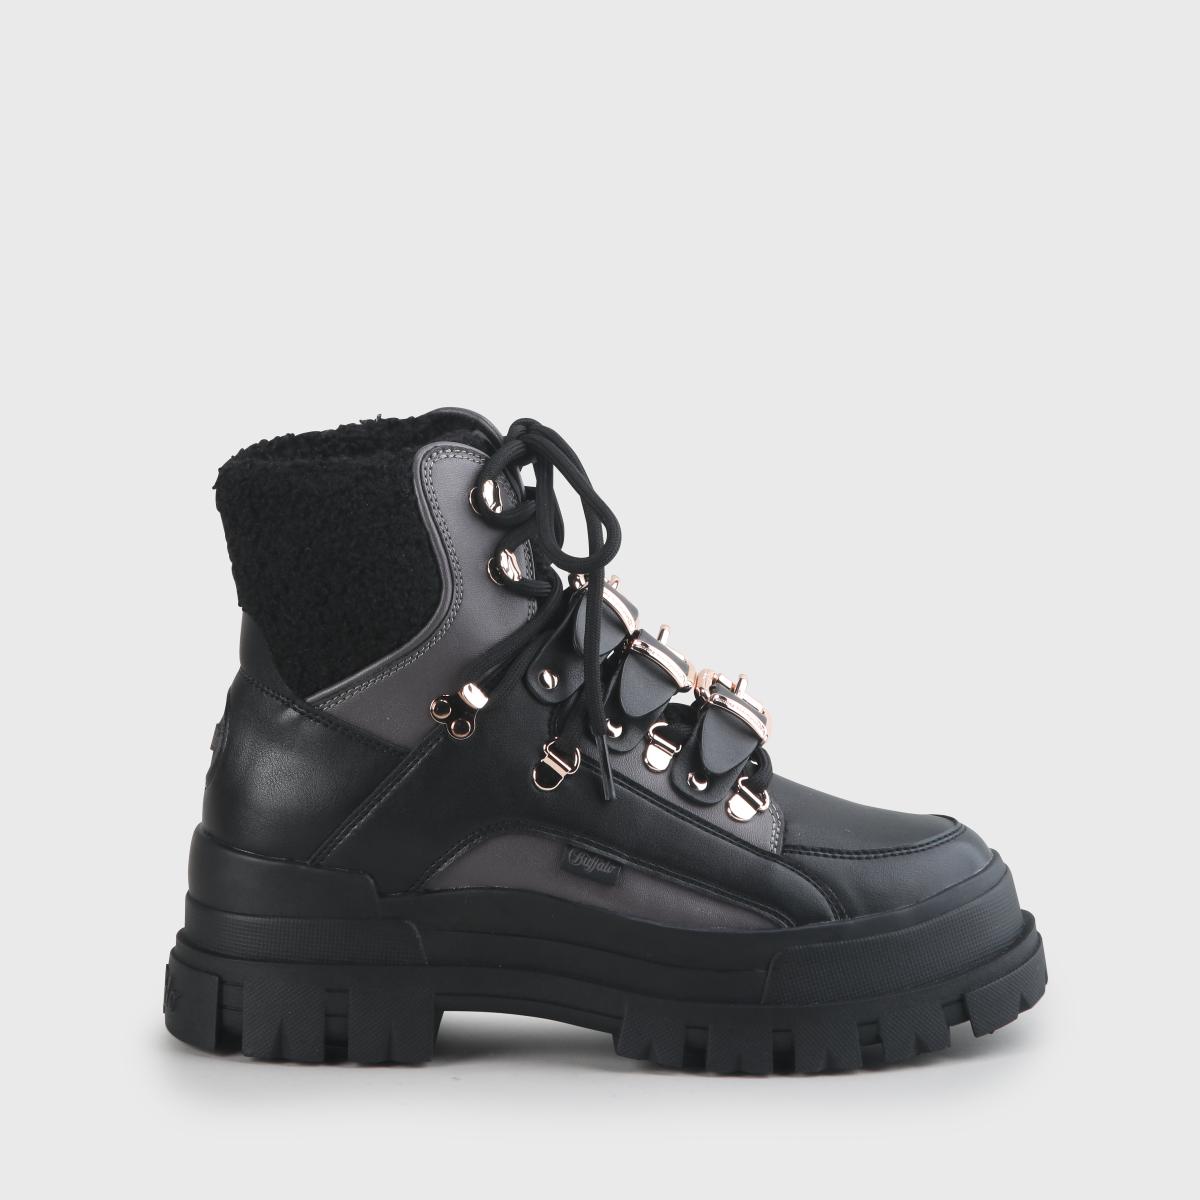 Buffalo MH X Buffalo Aspha Boot Black Dark Grey Damen Plateau Stiefel Boots